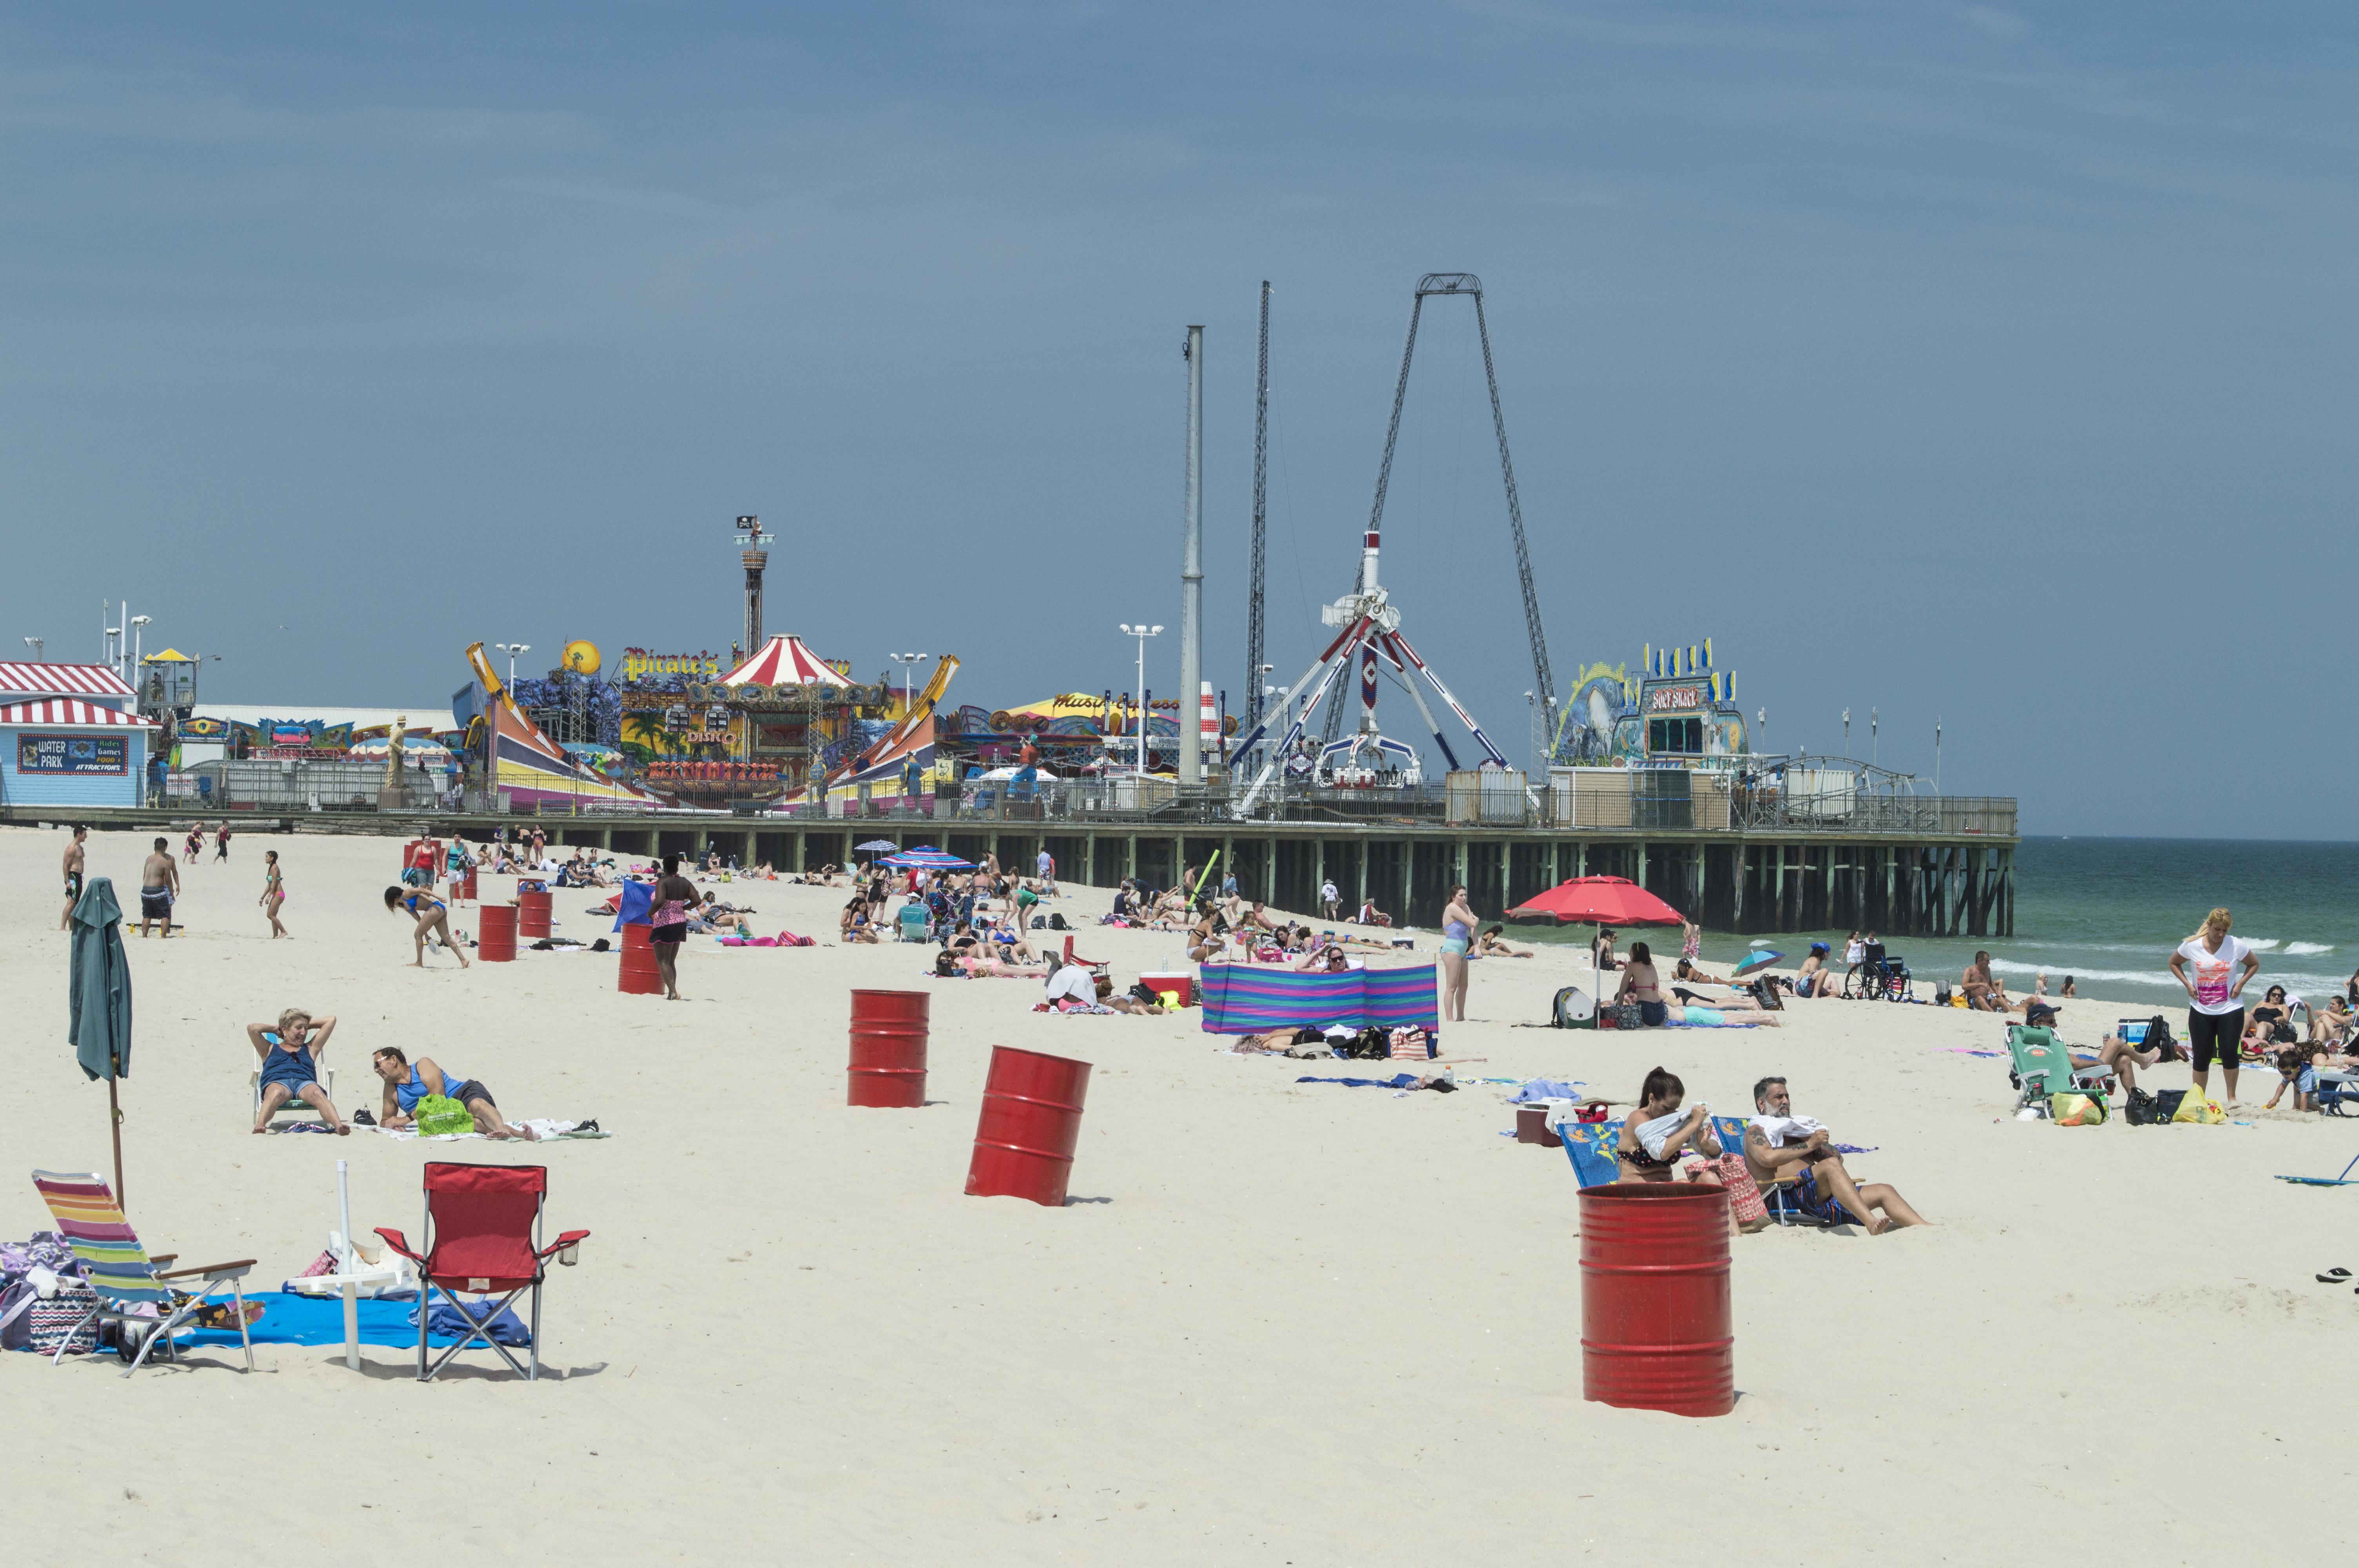 The Seaside Heights beachfront. (Photo: Daniel Nee)